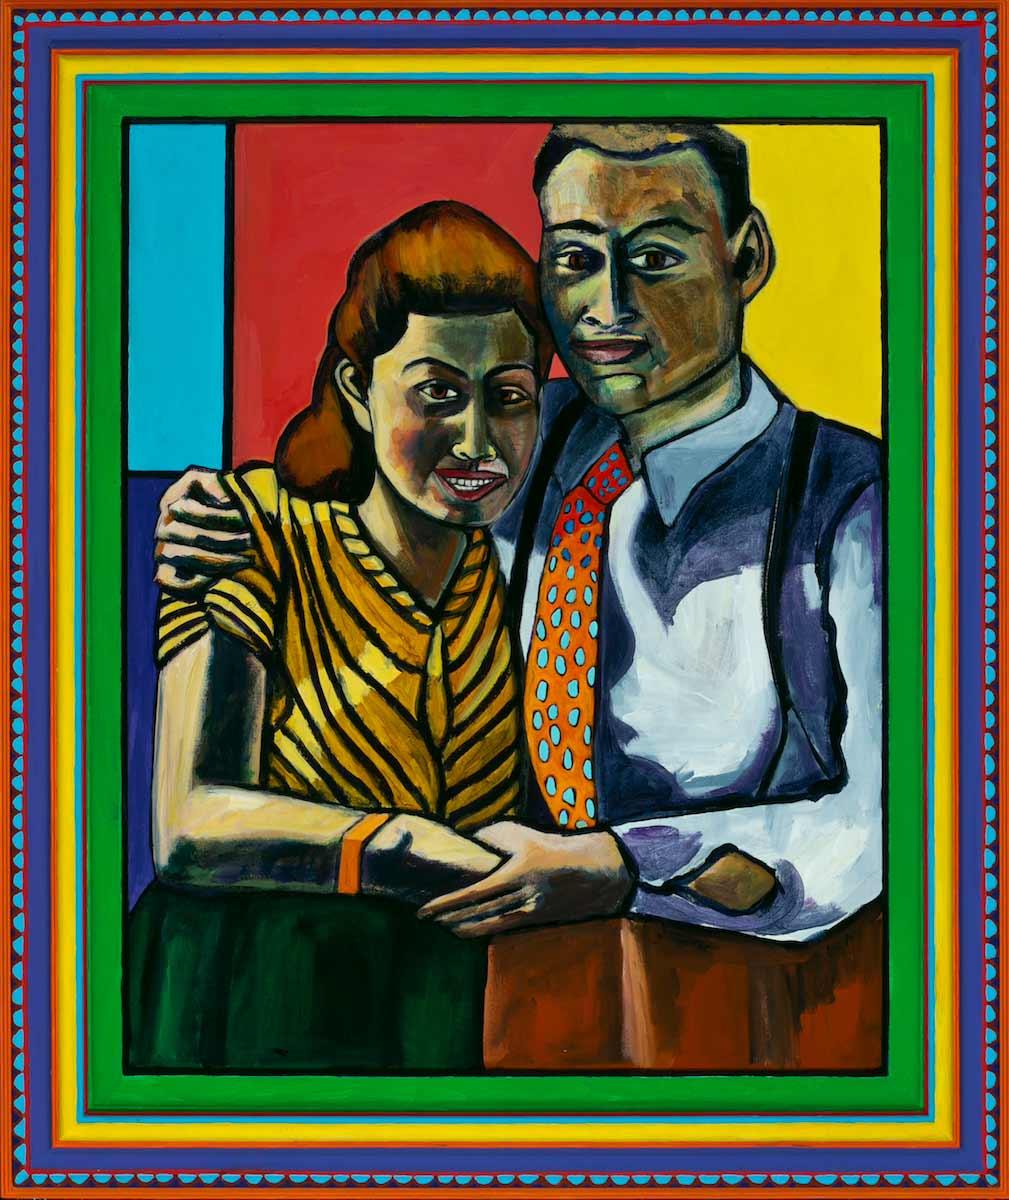 Family Portrait: Mom & Dad